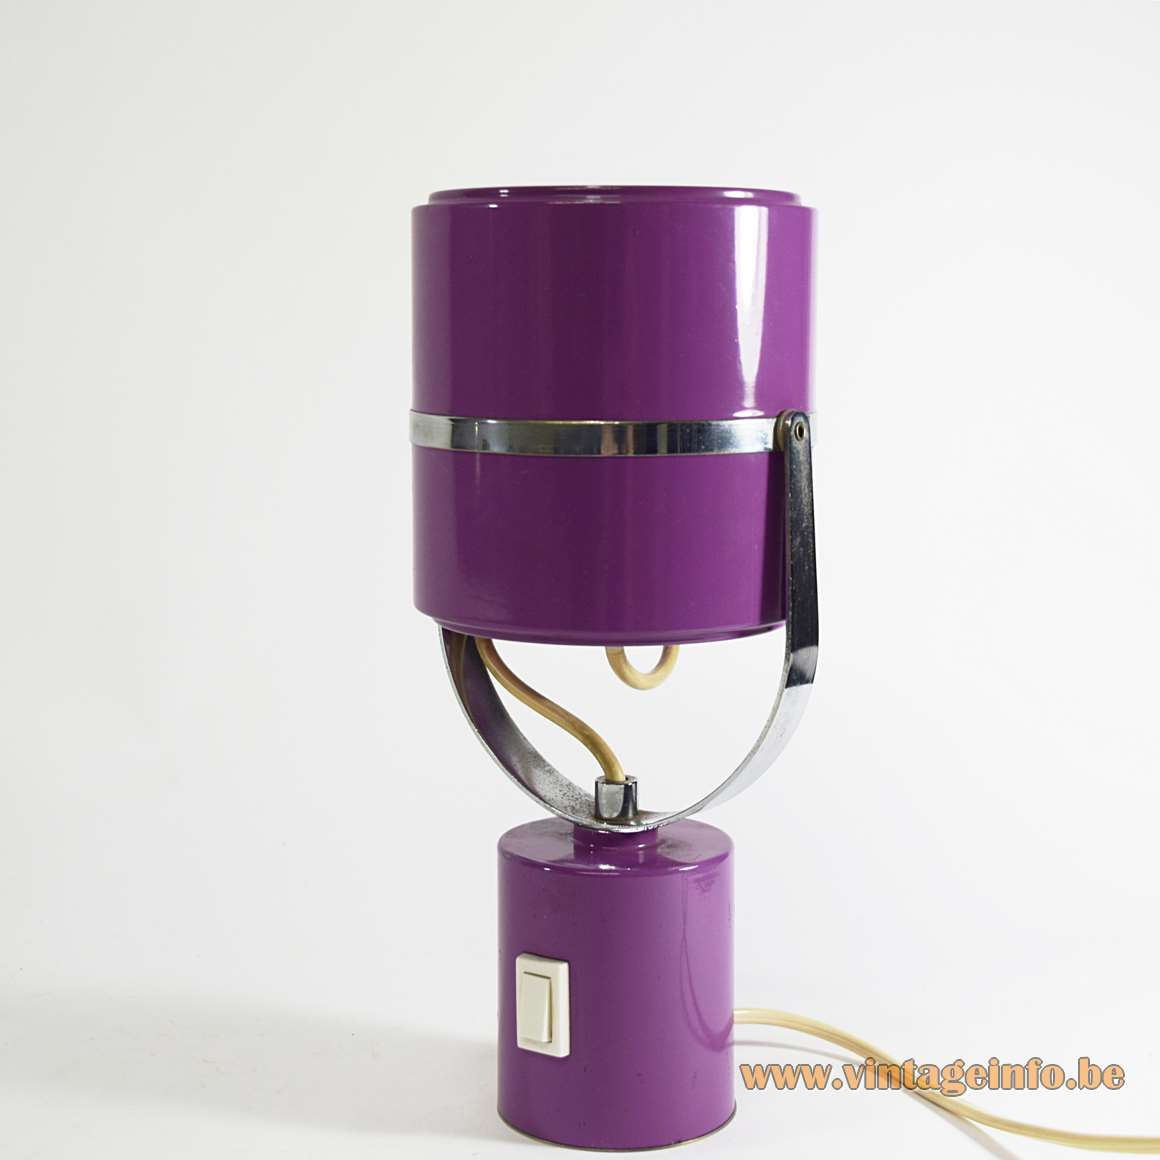 1970s Elma cylinder table lamp adjustable purple tubes chrome bar & ring aluminium reflector E14 socket Slovenia